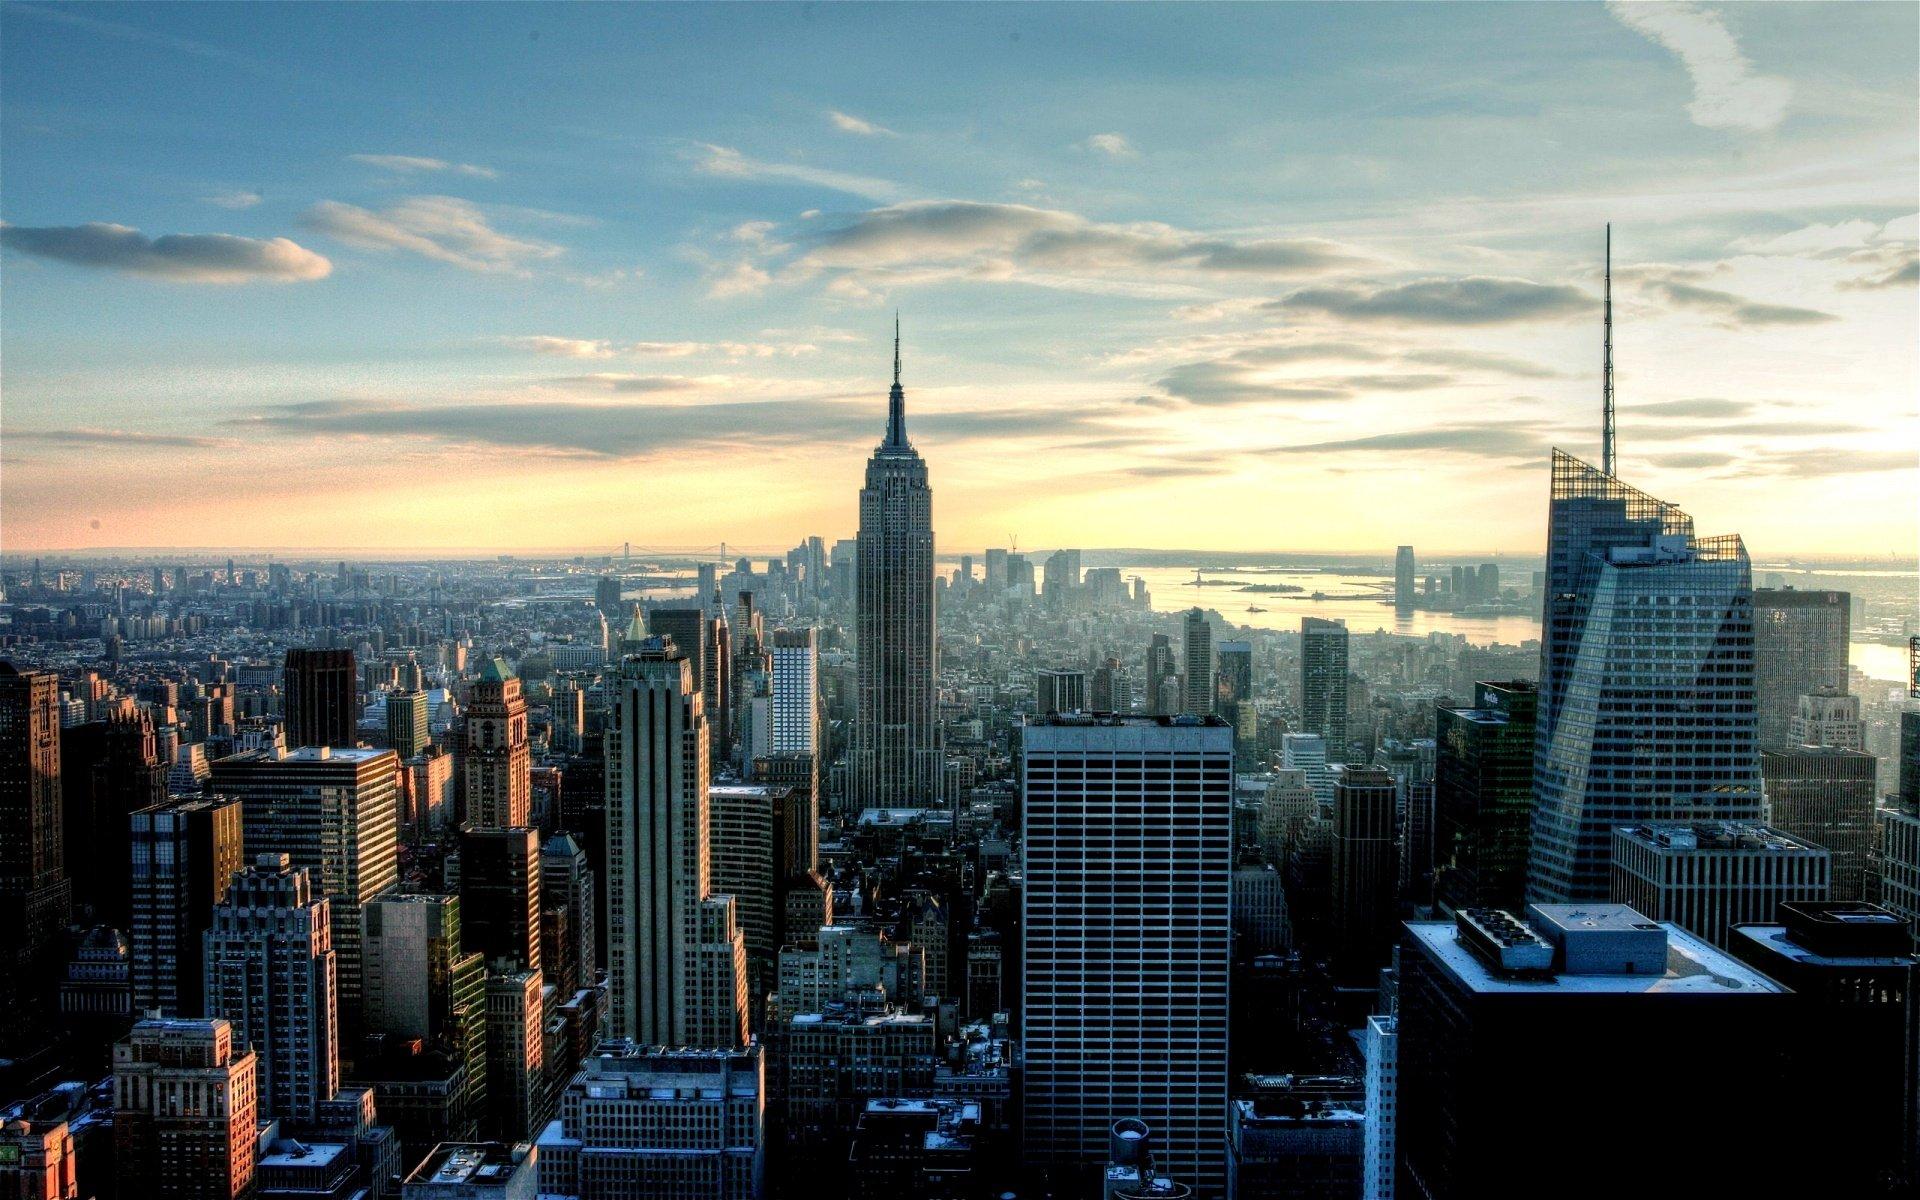 New York City Skyline Wallpapers wallpaper wallpaper hd background 1920x1200